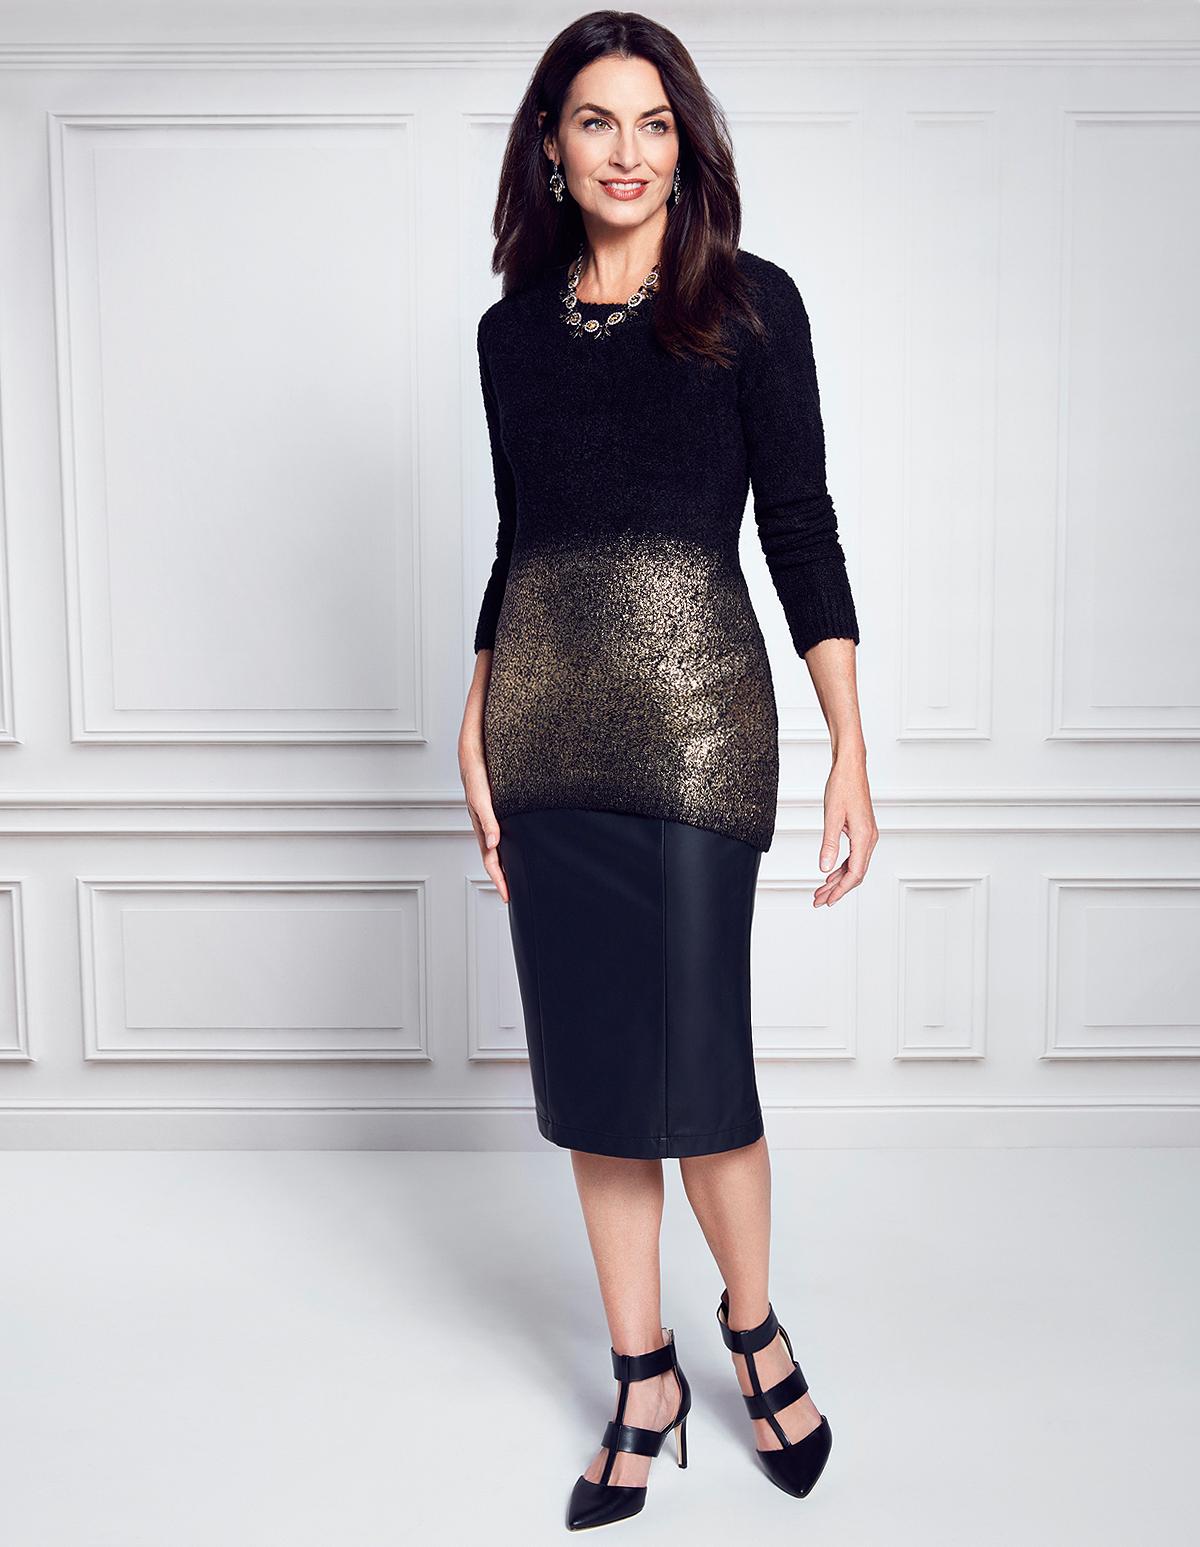 6993c47f7c6e ... Black Faux Leather Pencil Skirt, Black, hi-res ...